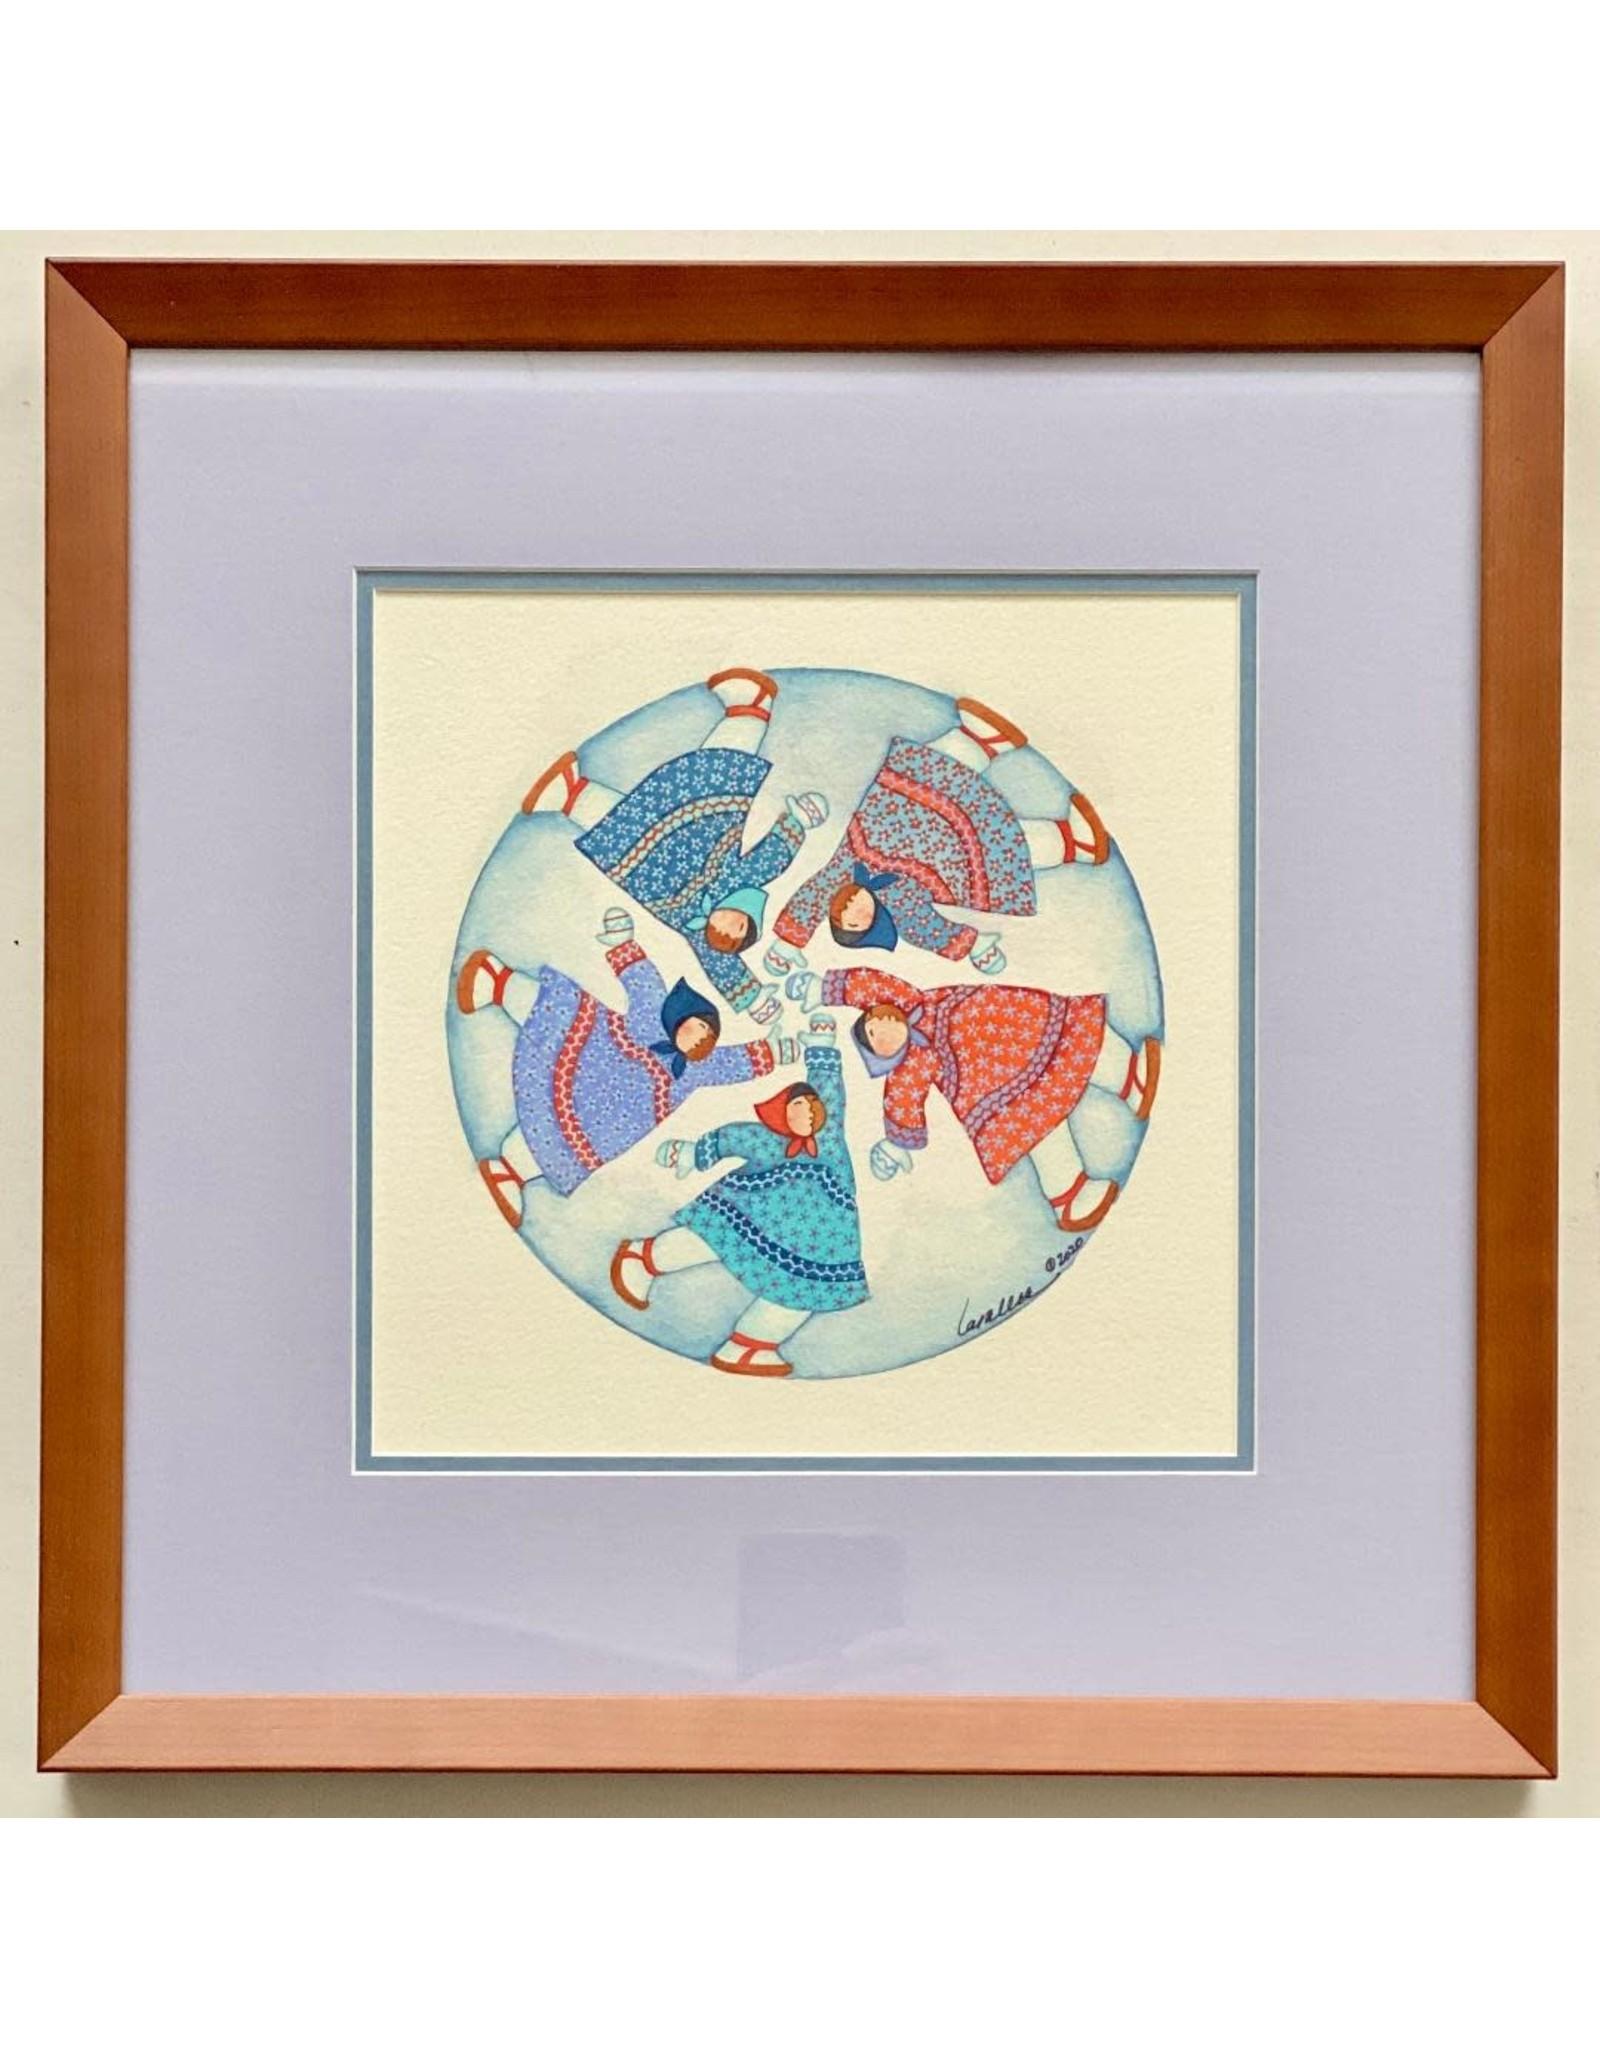 Barbara Lavallee Running In Circles (framed original) | Barbara Lavallee